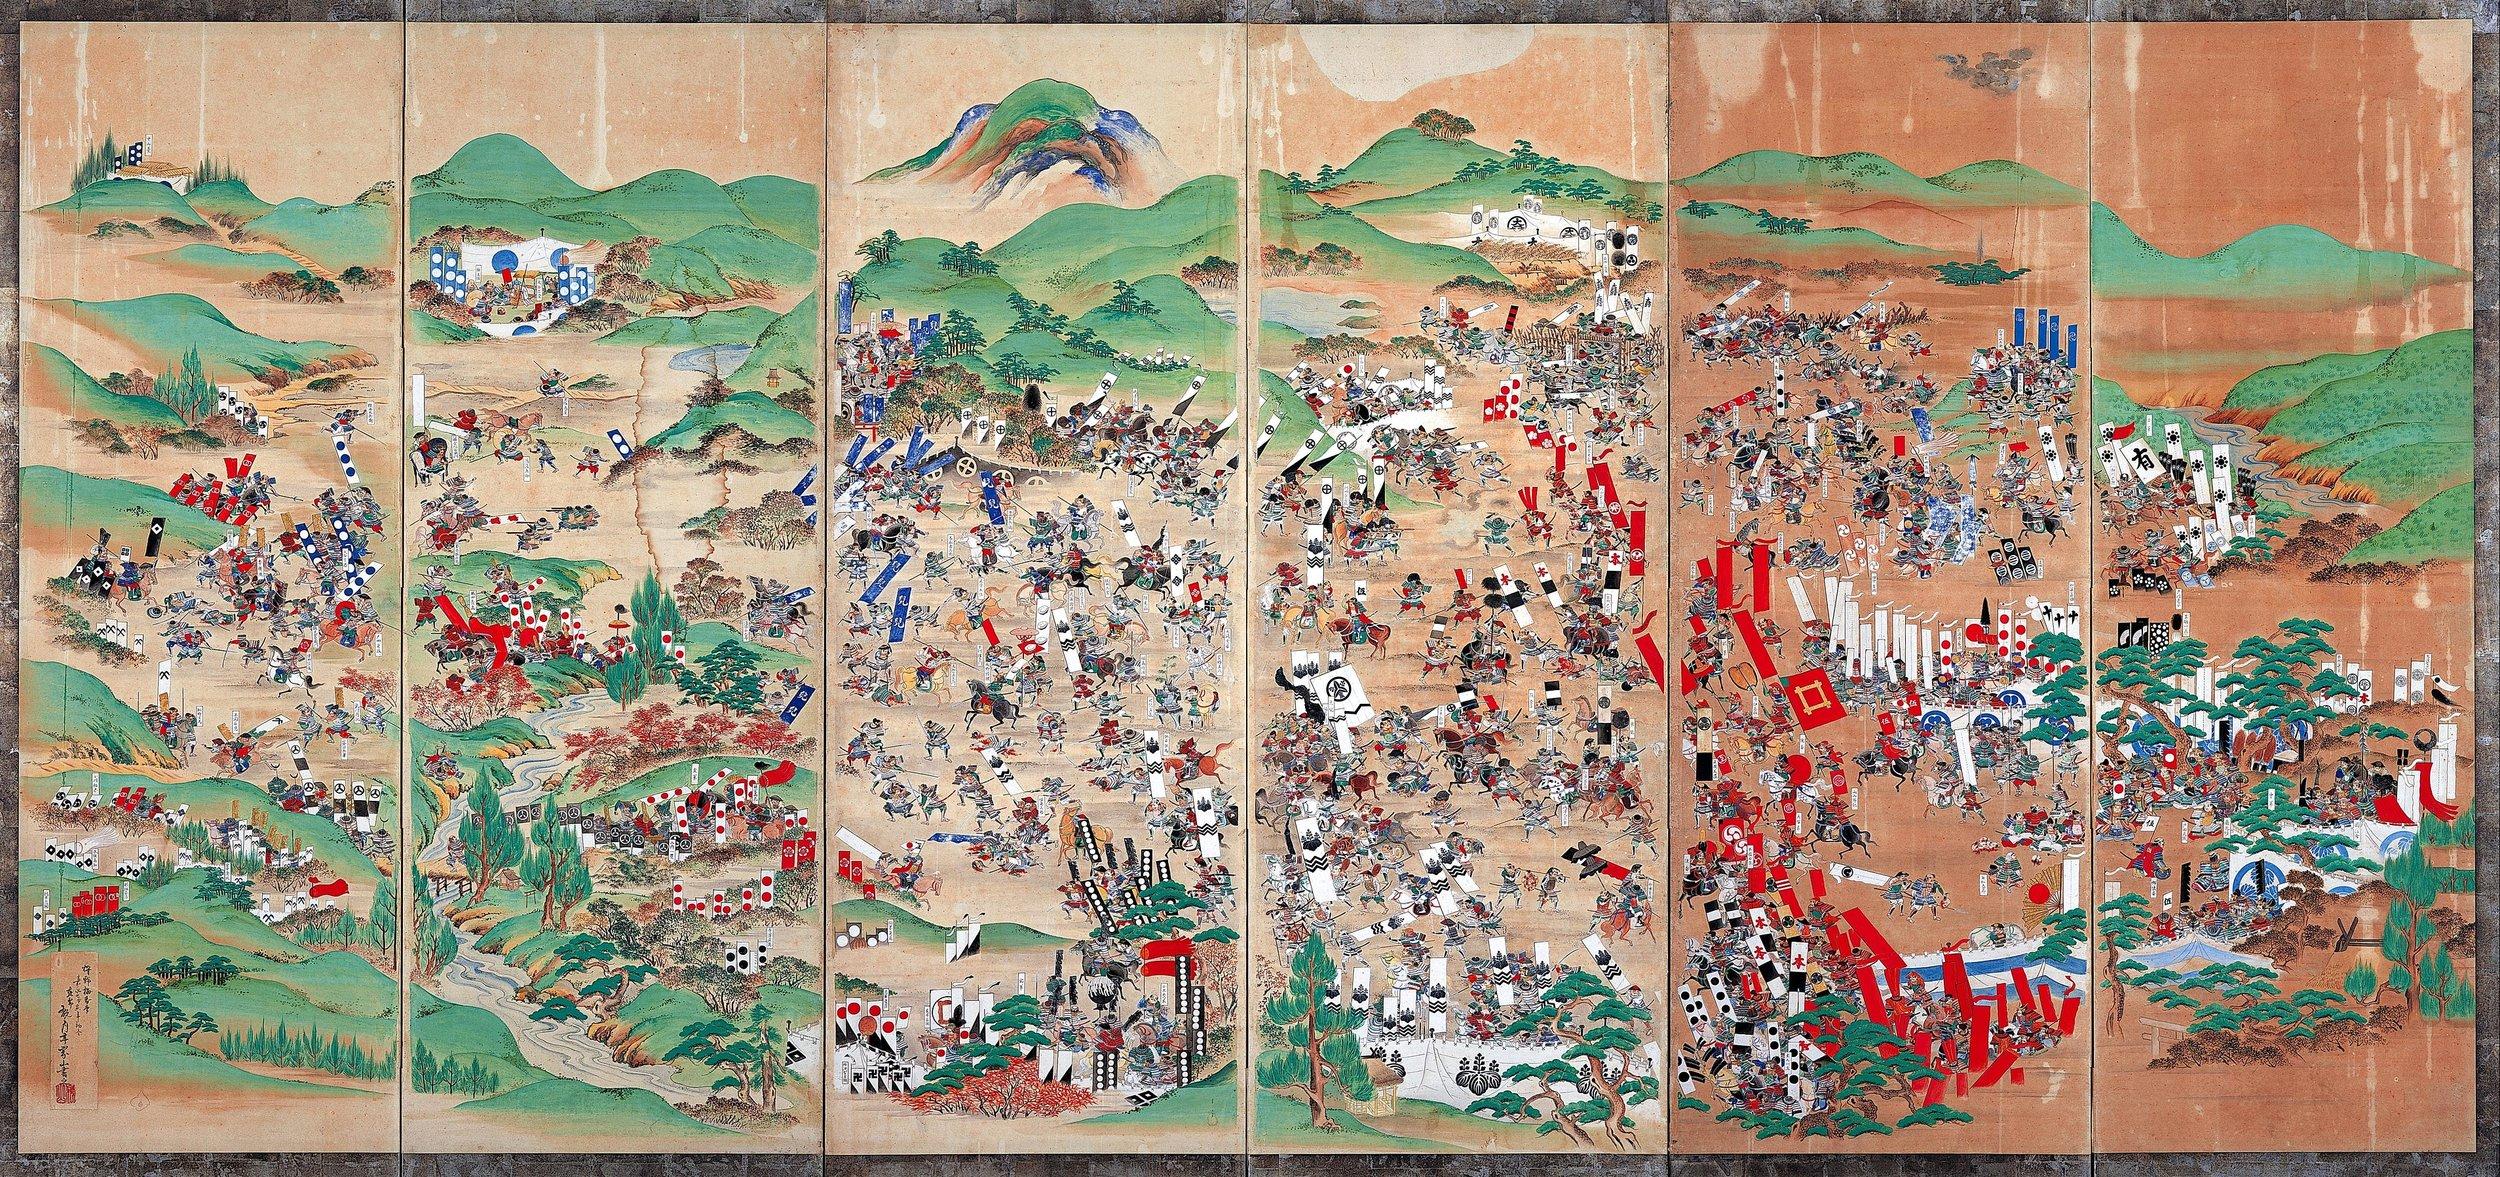 Sekigahara Kassen Byōbu  , Japanese screen depicting the Battle of Sekigahara. This 1854 replica recreates the original  Hikone-jō Bon Sekigahara Kassen Byōbu  by Sadanobu Kanō from the 1620s.